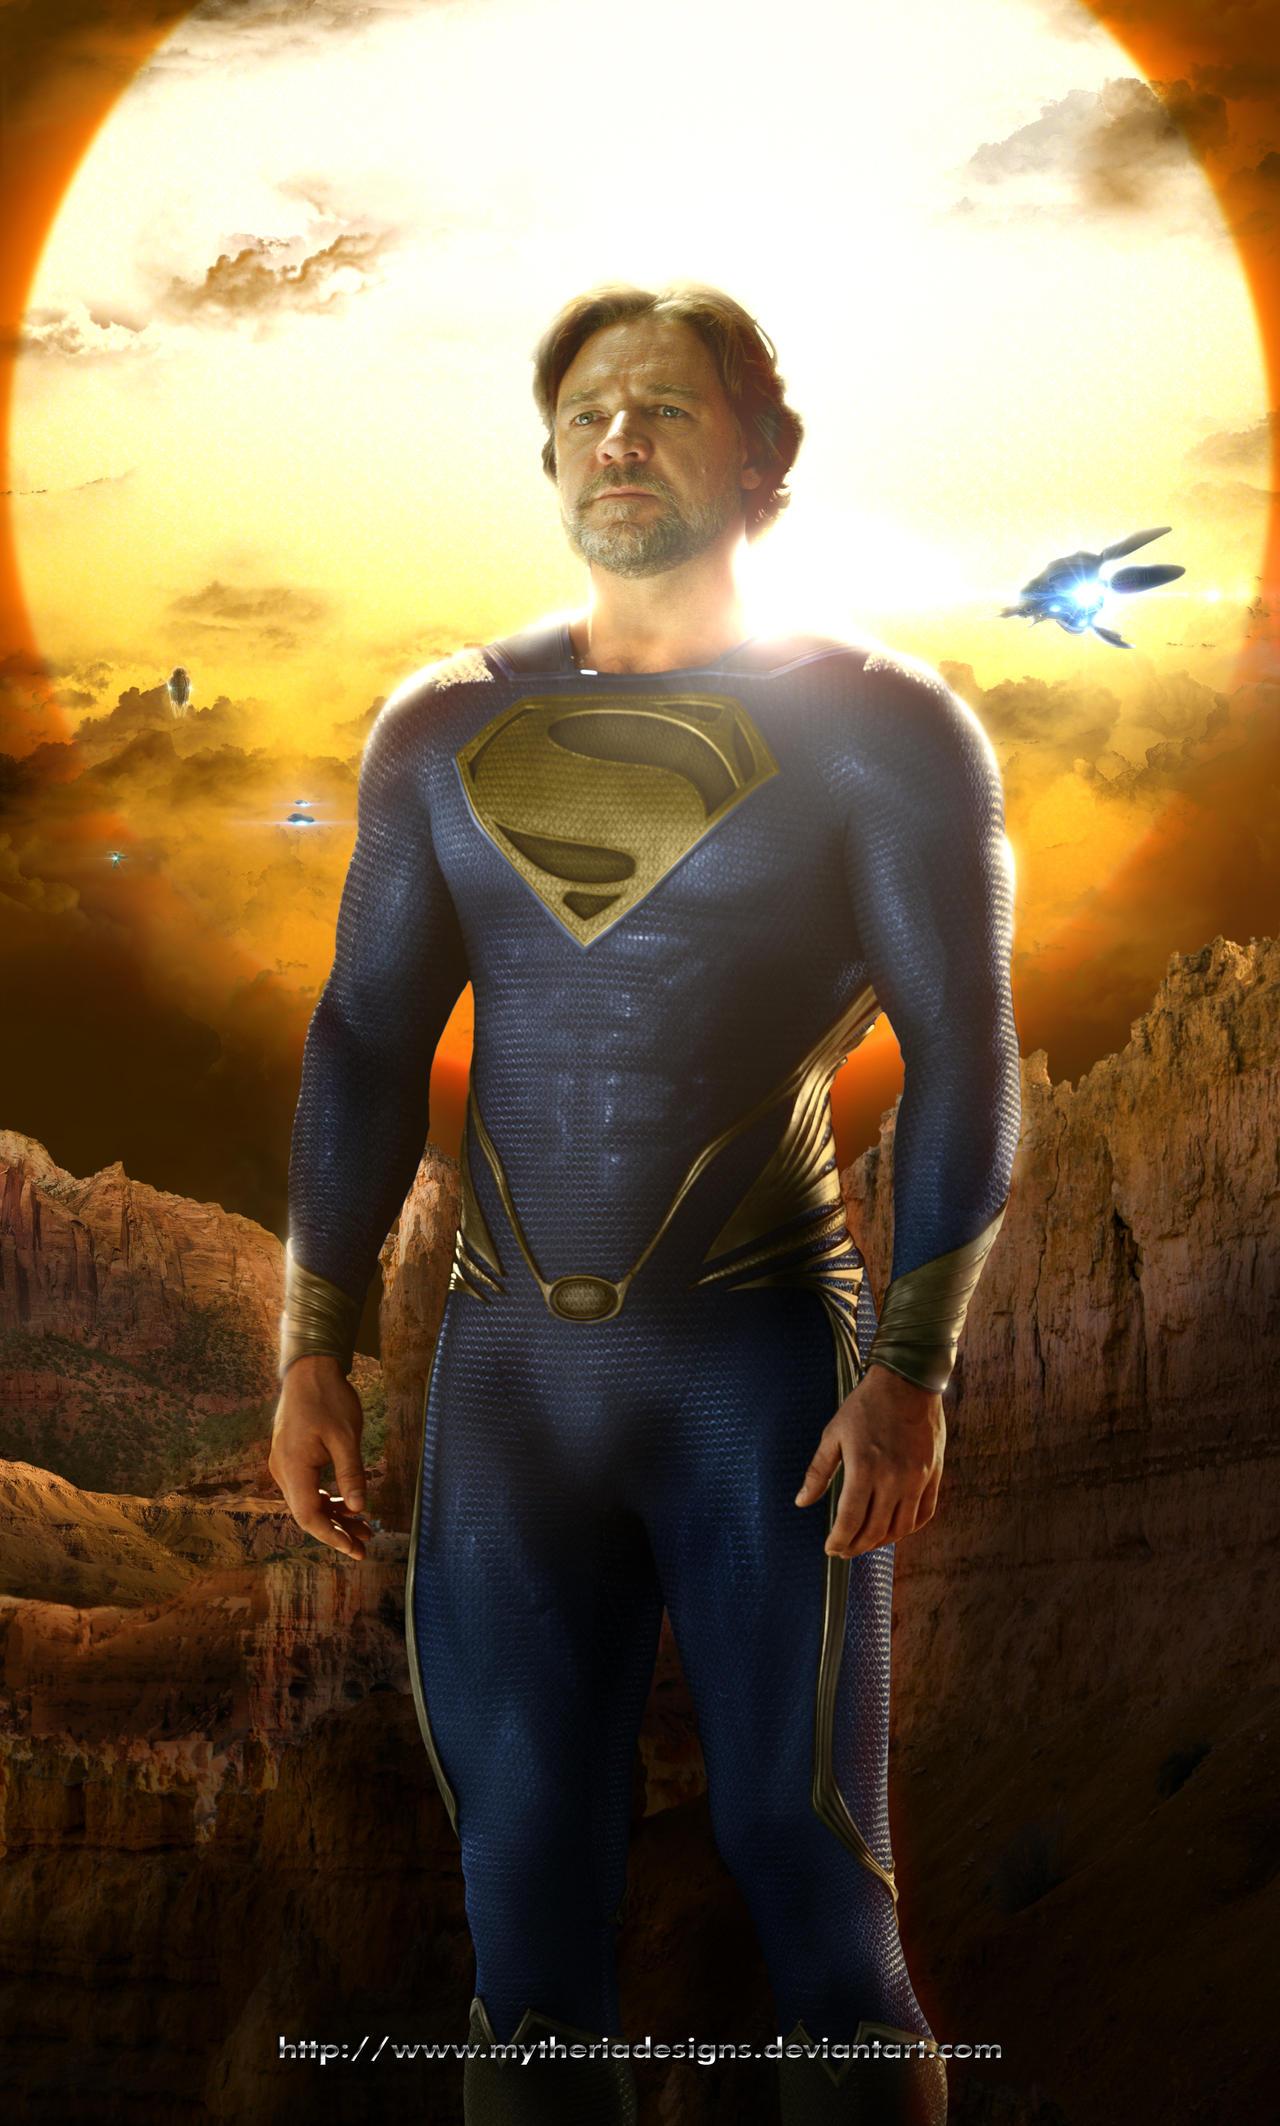 Abençoando esse fórum  Man_of_steel__jor_el_on_krypton_by_mytheriadesigns-d7wc7dd